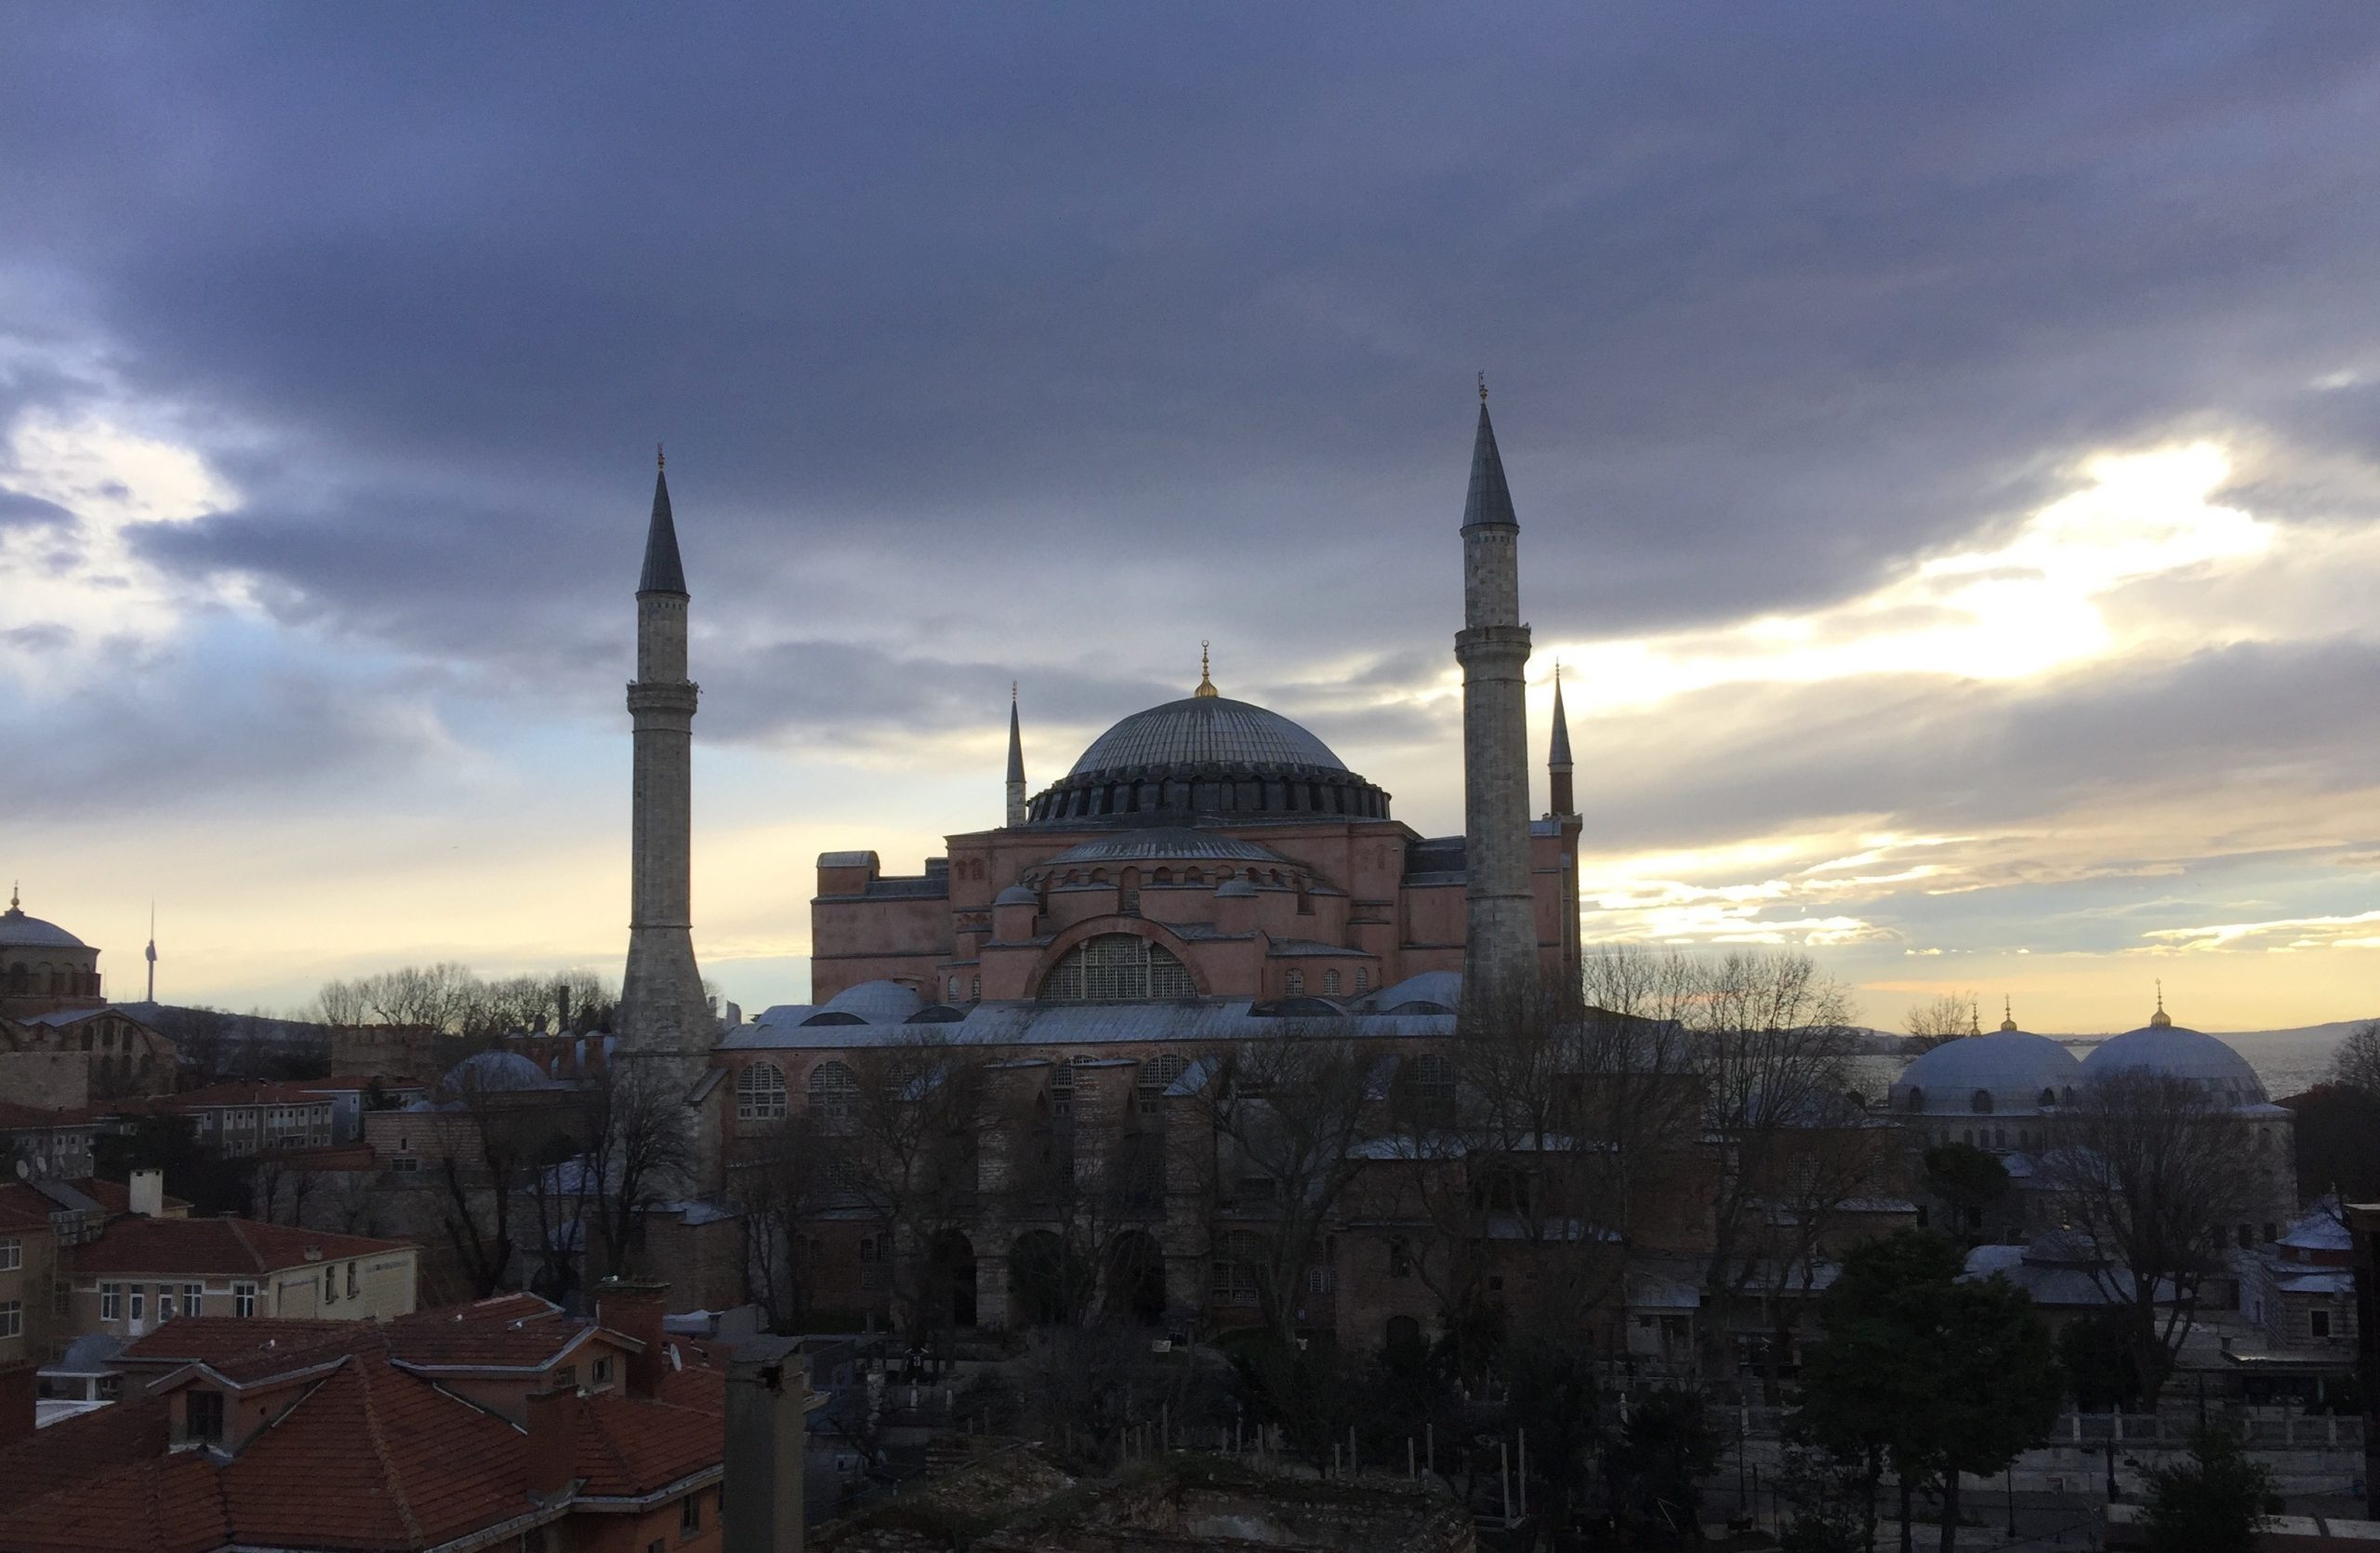 Hagia Sophia Matters: Culture, Human Dignity and the Legacies of Empires